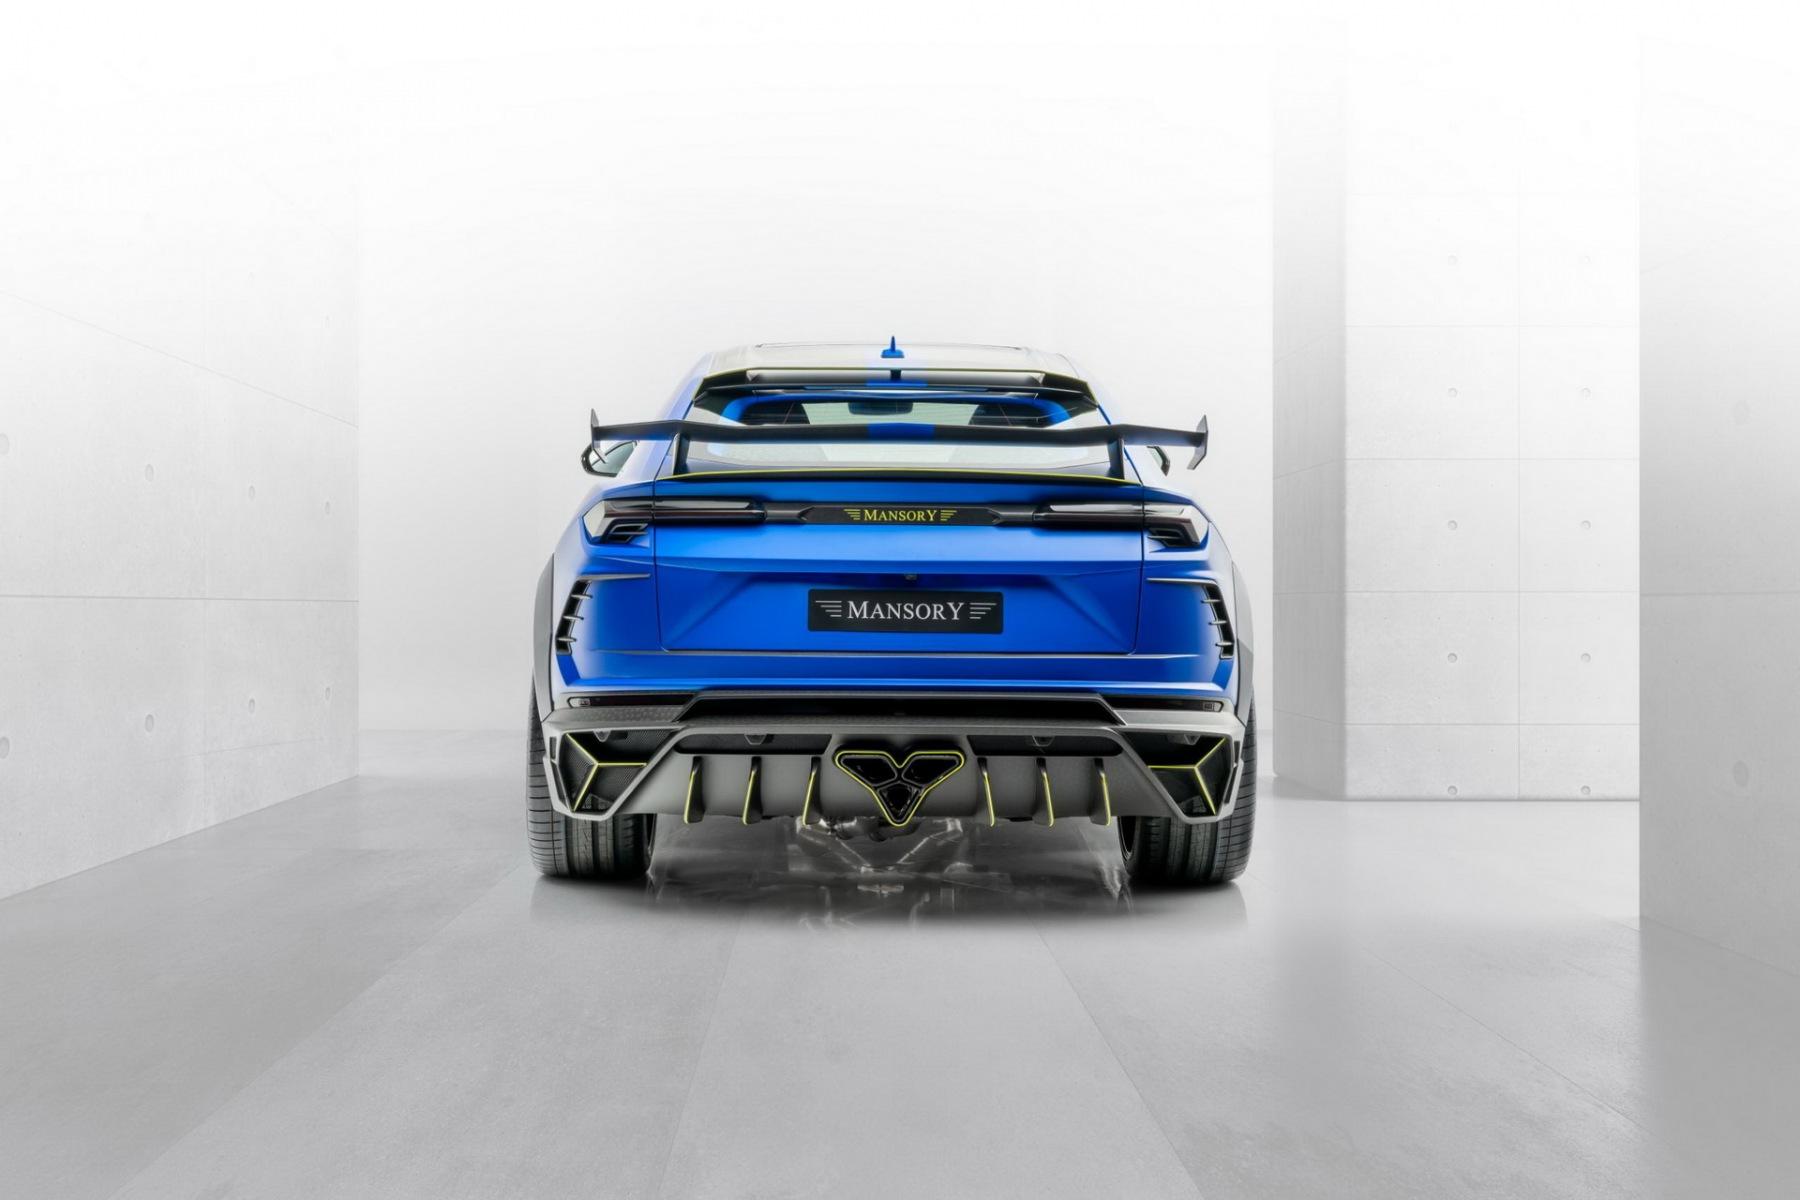 Lamborghini Urus - Tuning Mansory Venatus